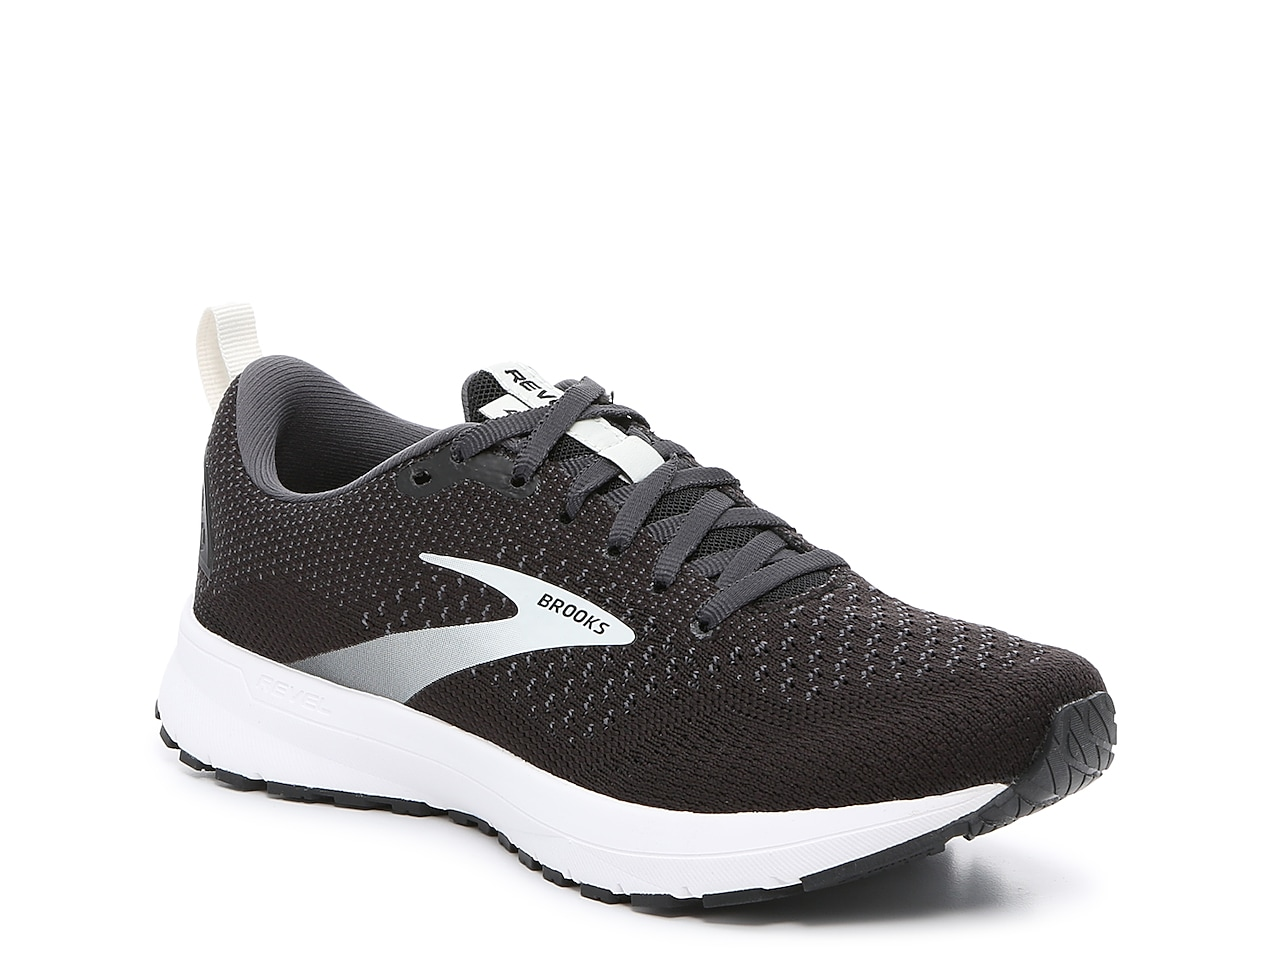 Revel 4 Running Shoe - Women's